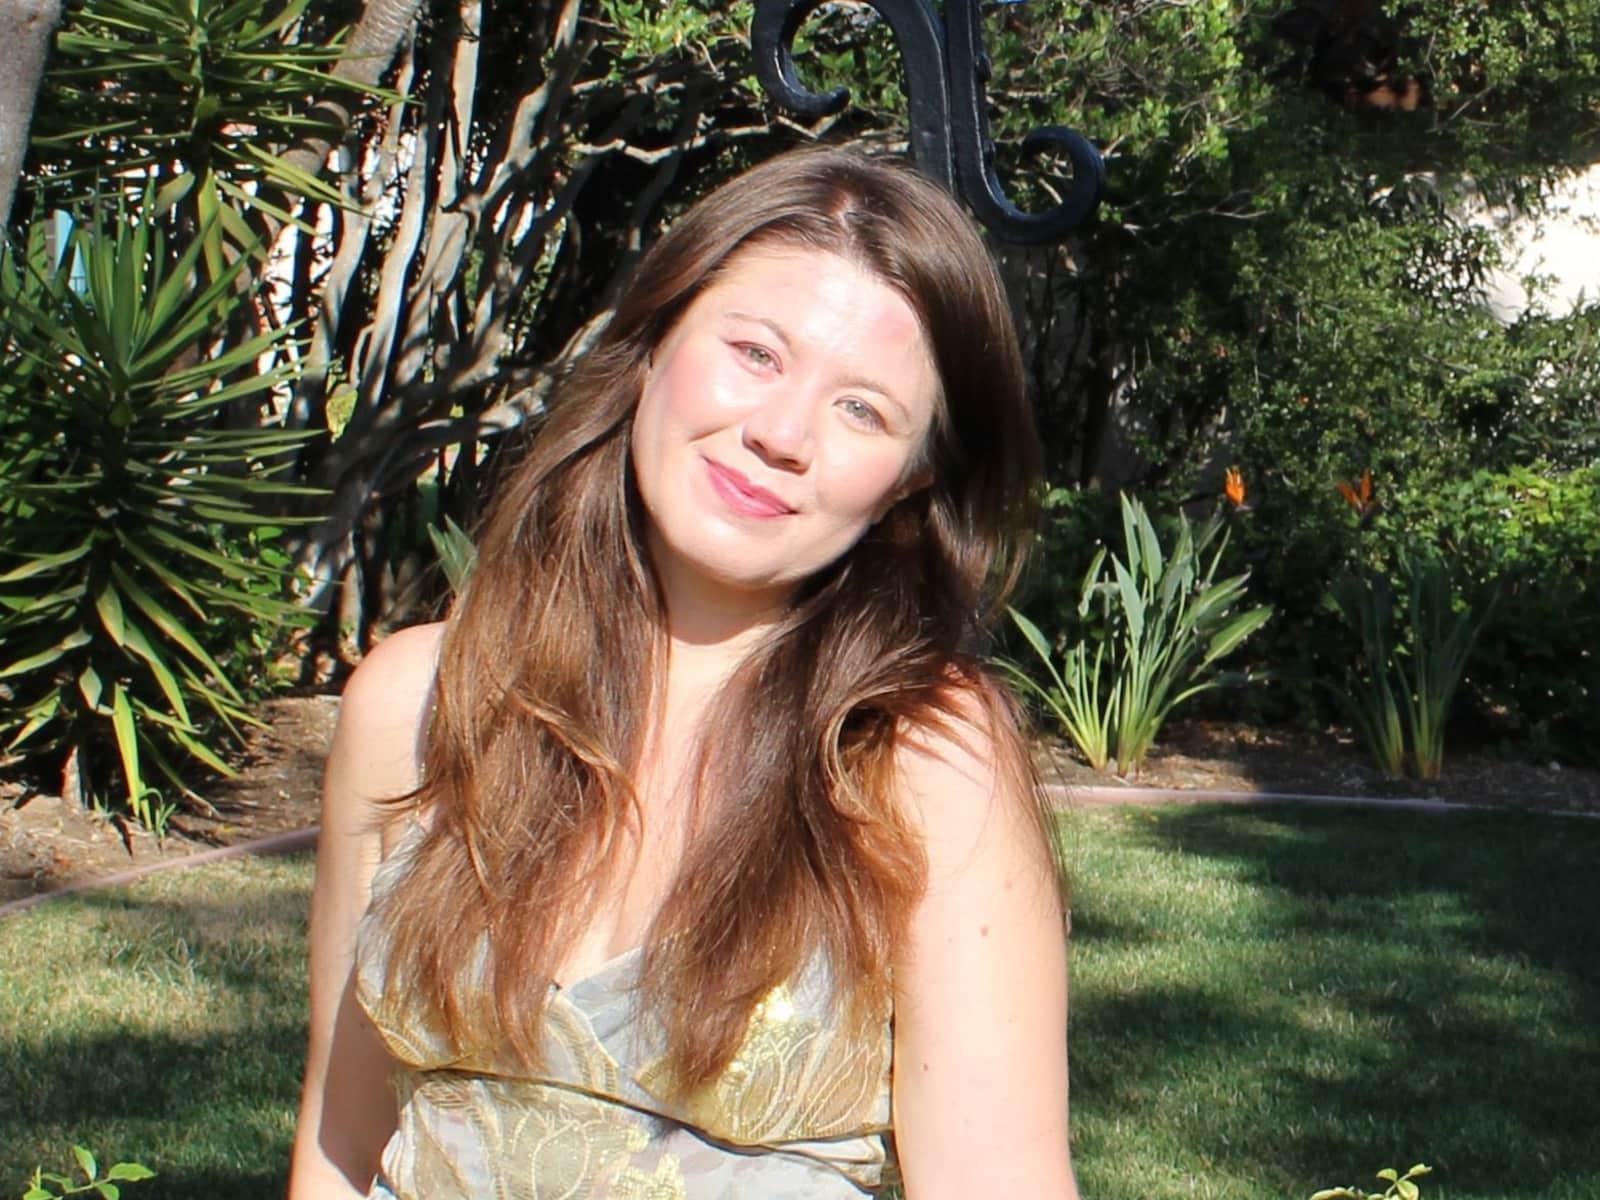 Christa from Santa Barbara, California, United States